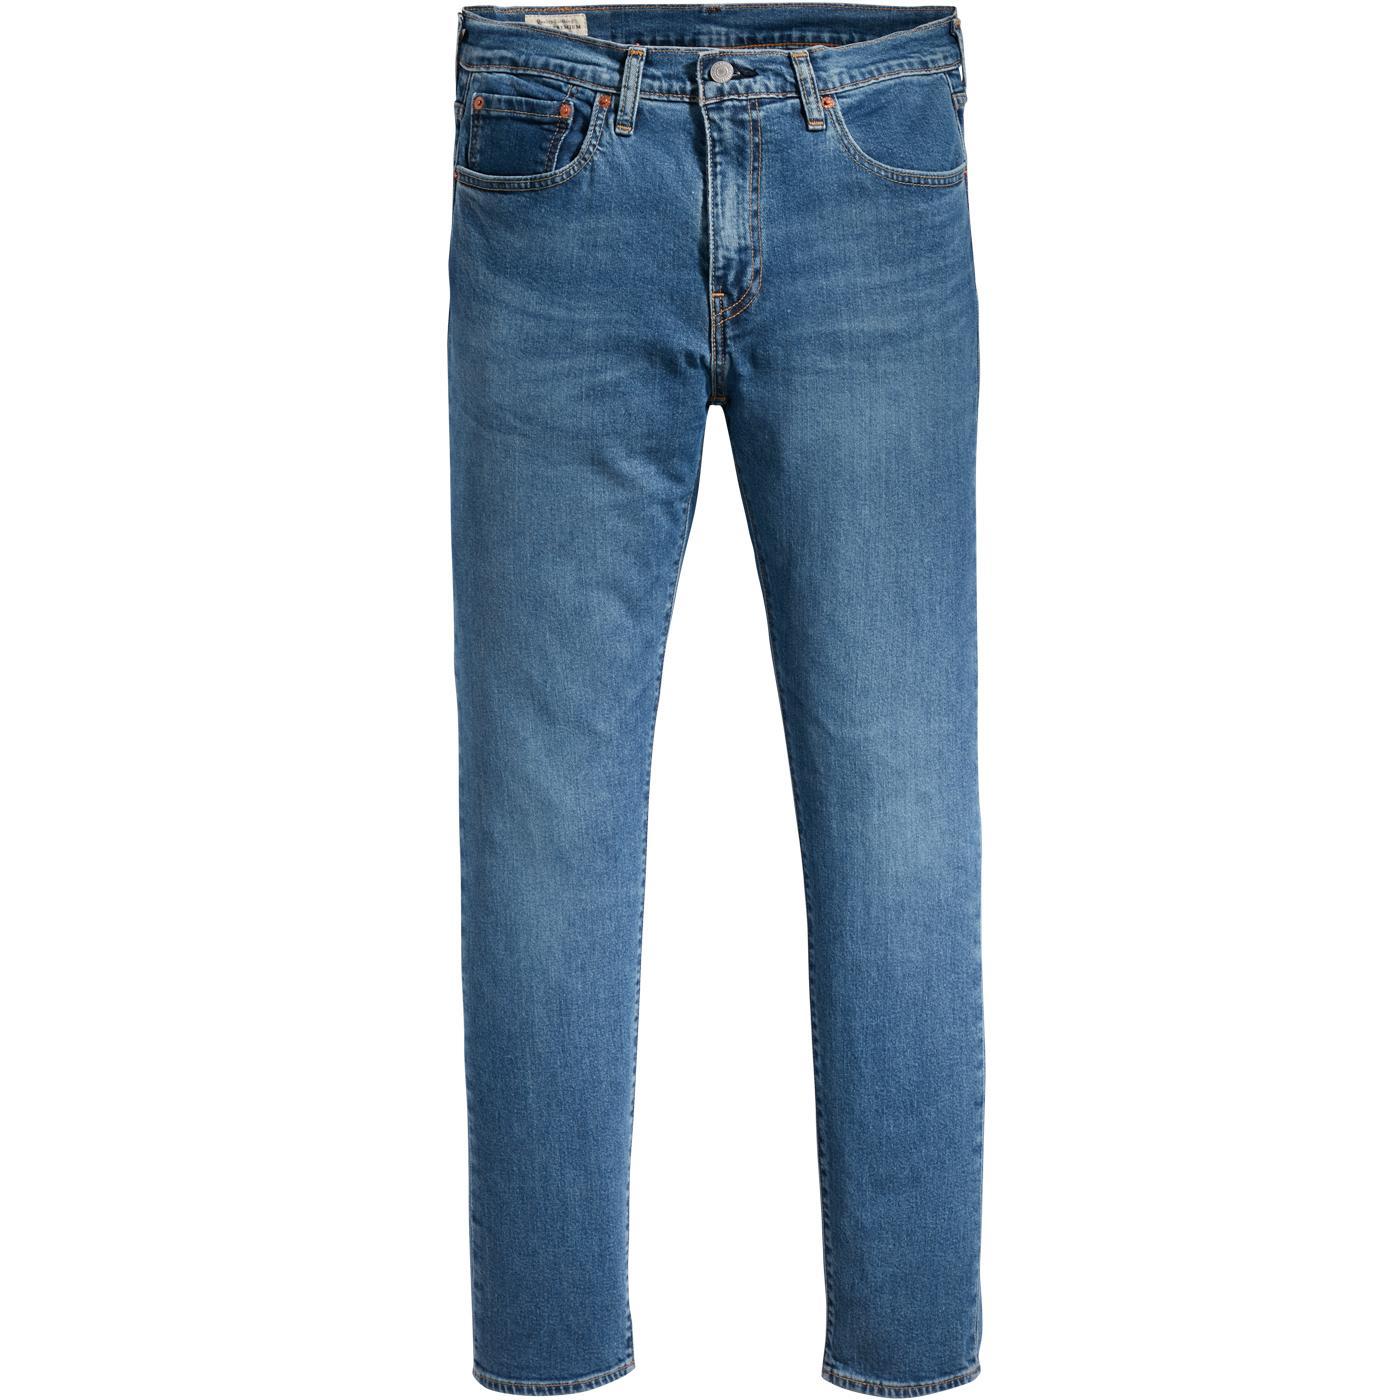 LEVI'S 512 Slim Taper Jeans (Corfu Spanish Angels)